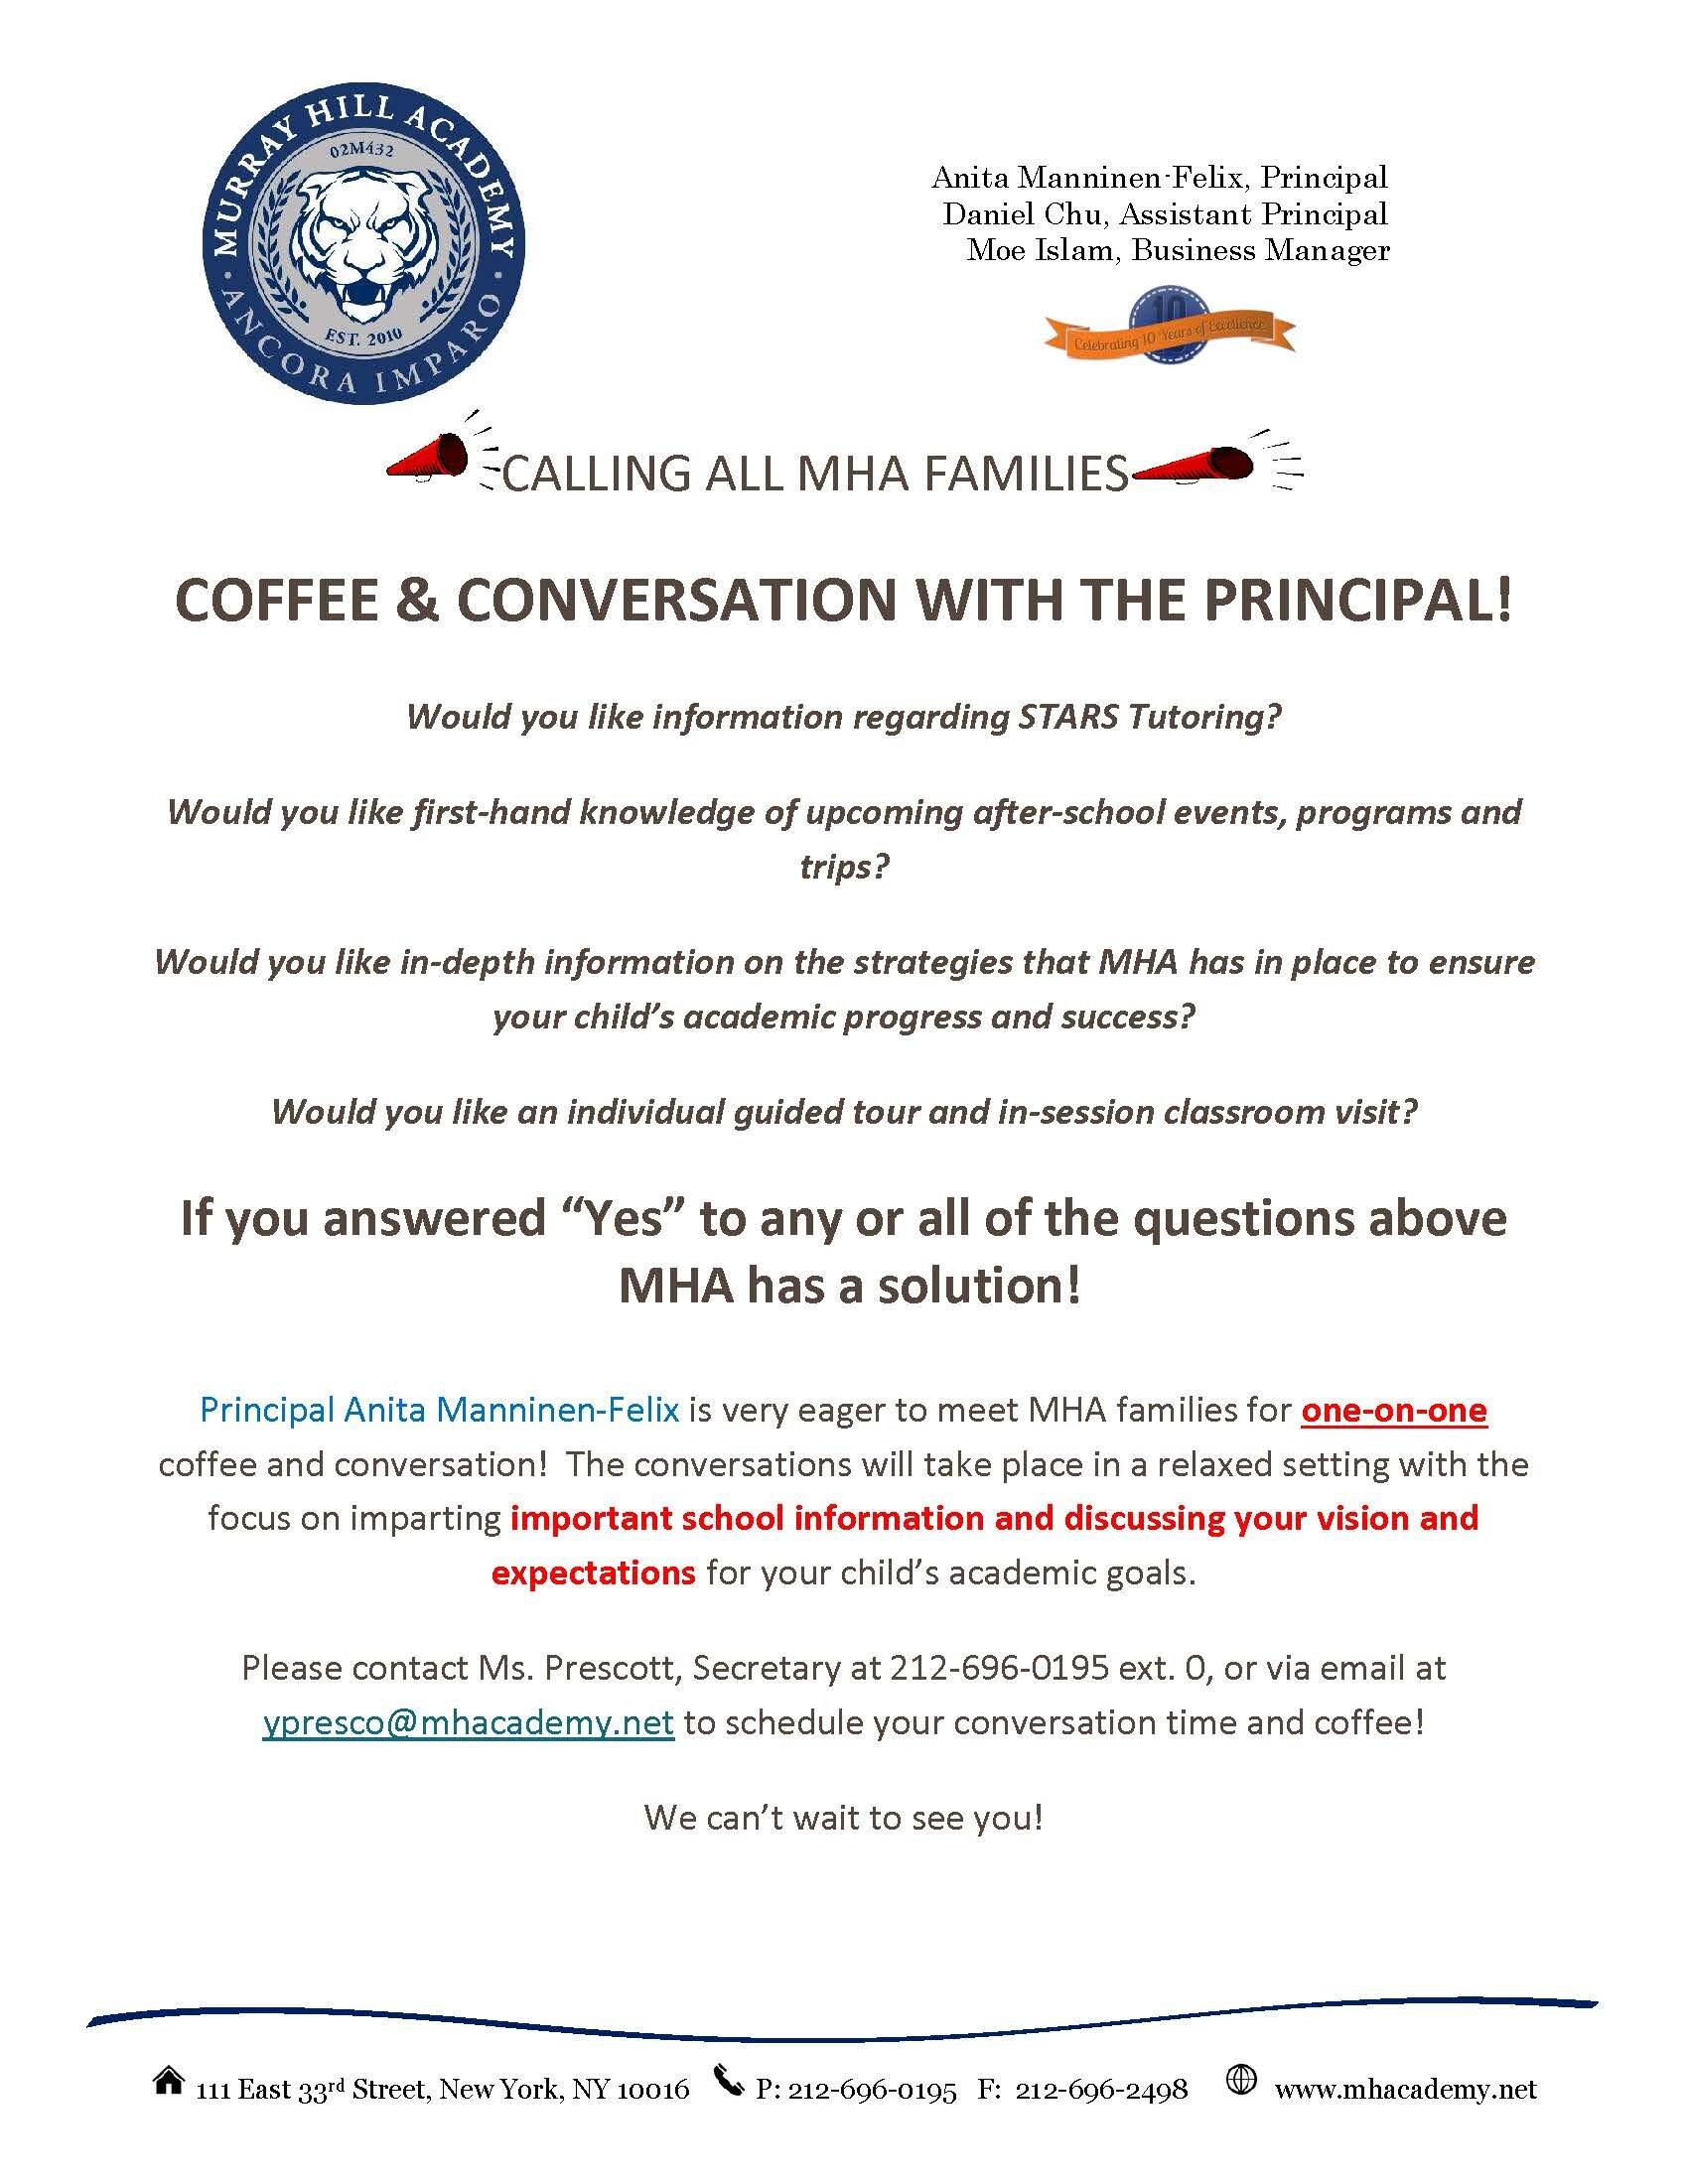 COFFEE & CONVERSATION WITH THE PRINCIPAL.jpg